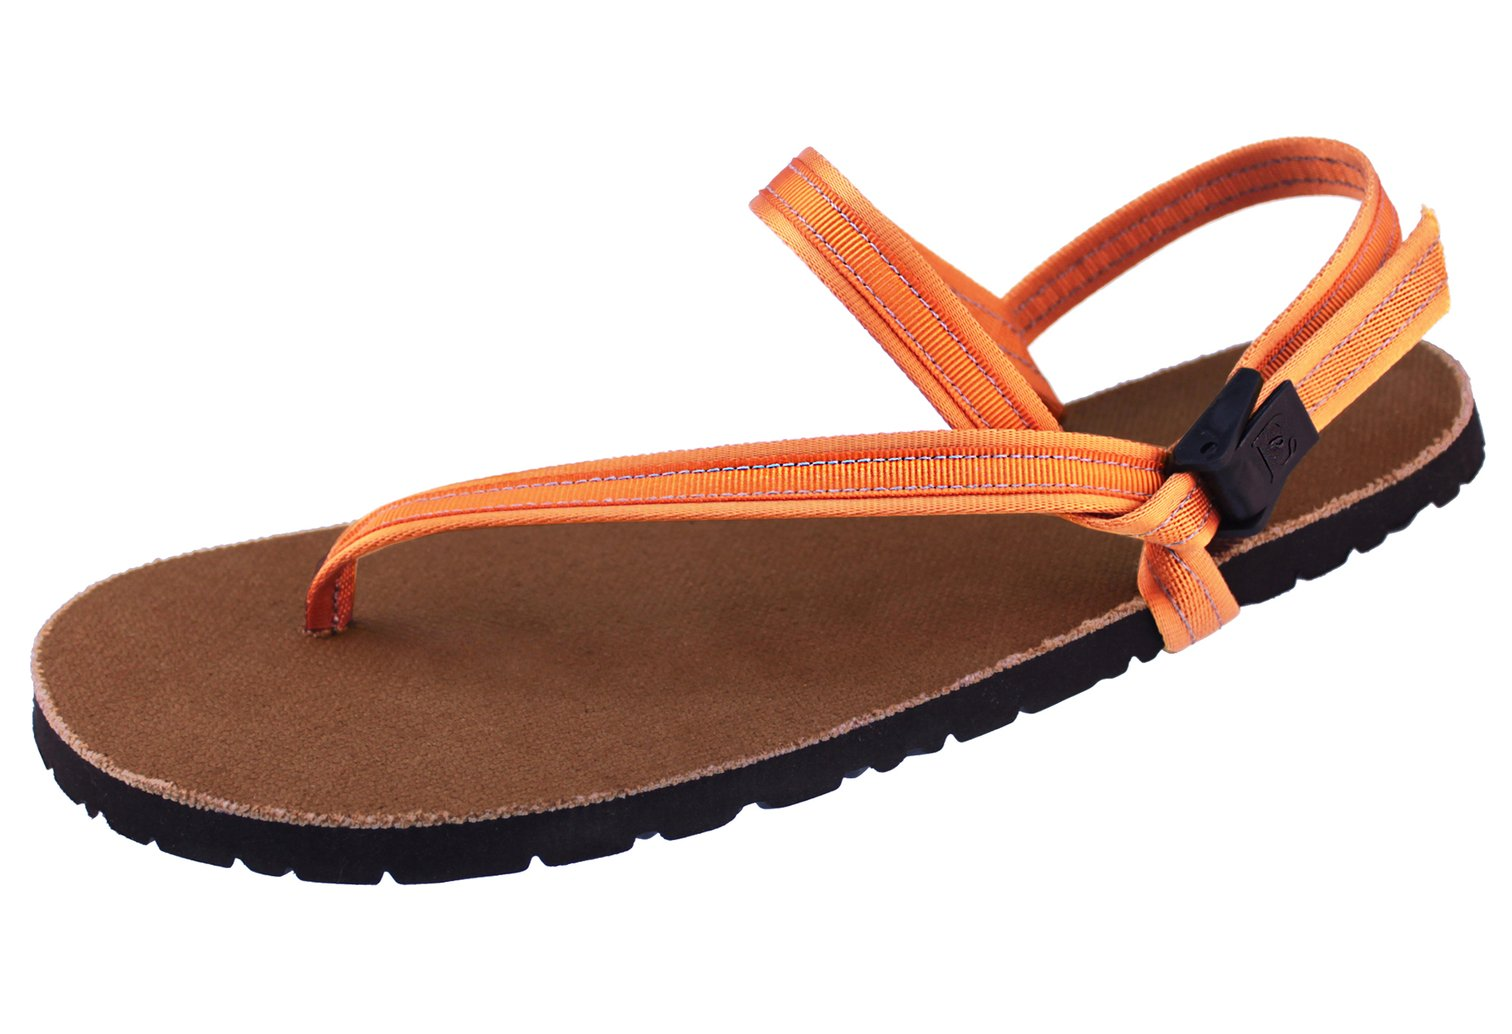 Alpha Lifestyle Sandals Picture 0